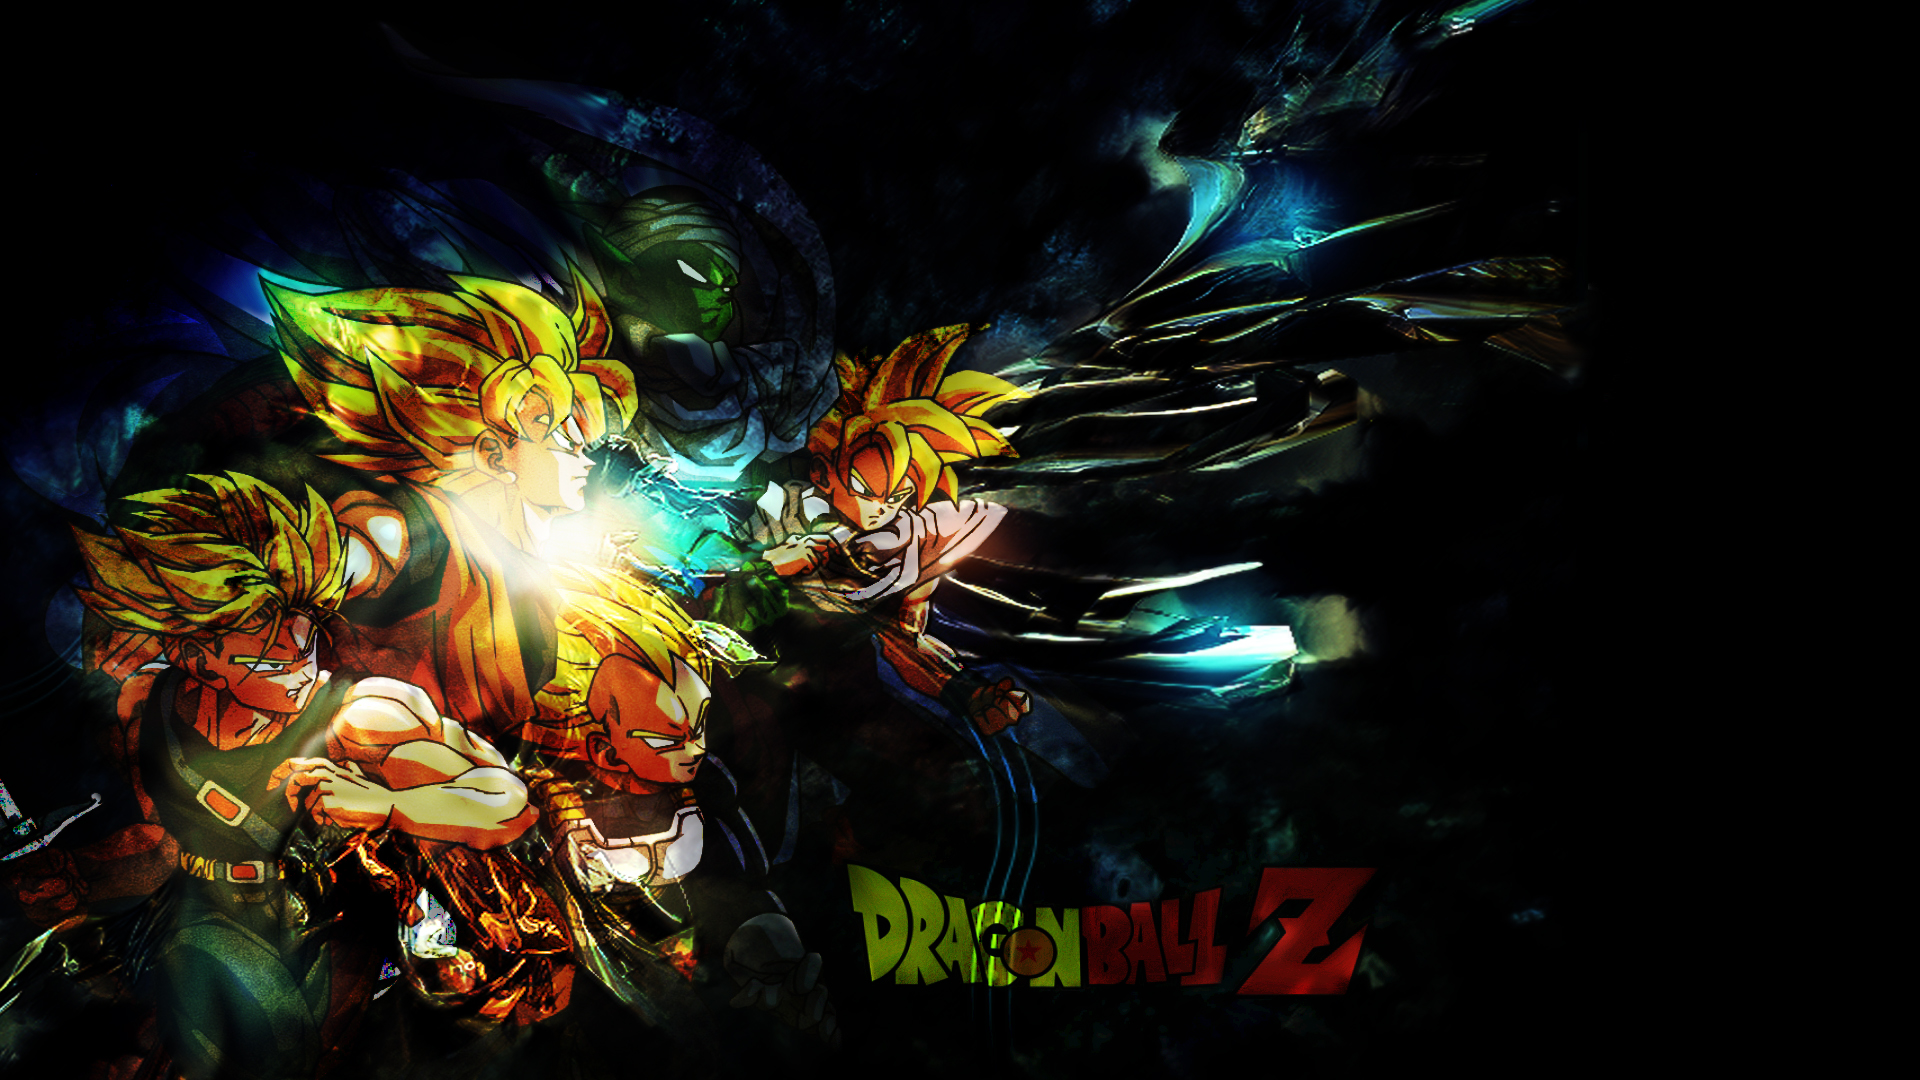 Dragonball Z PS3 Wallpaper by The-Potara-Fusion on DeviantArt